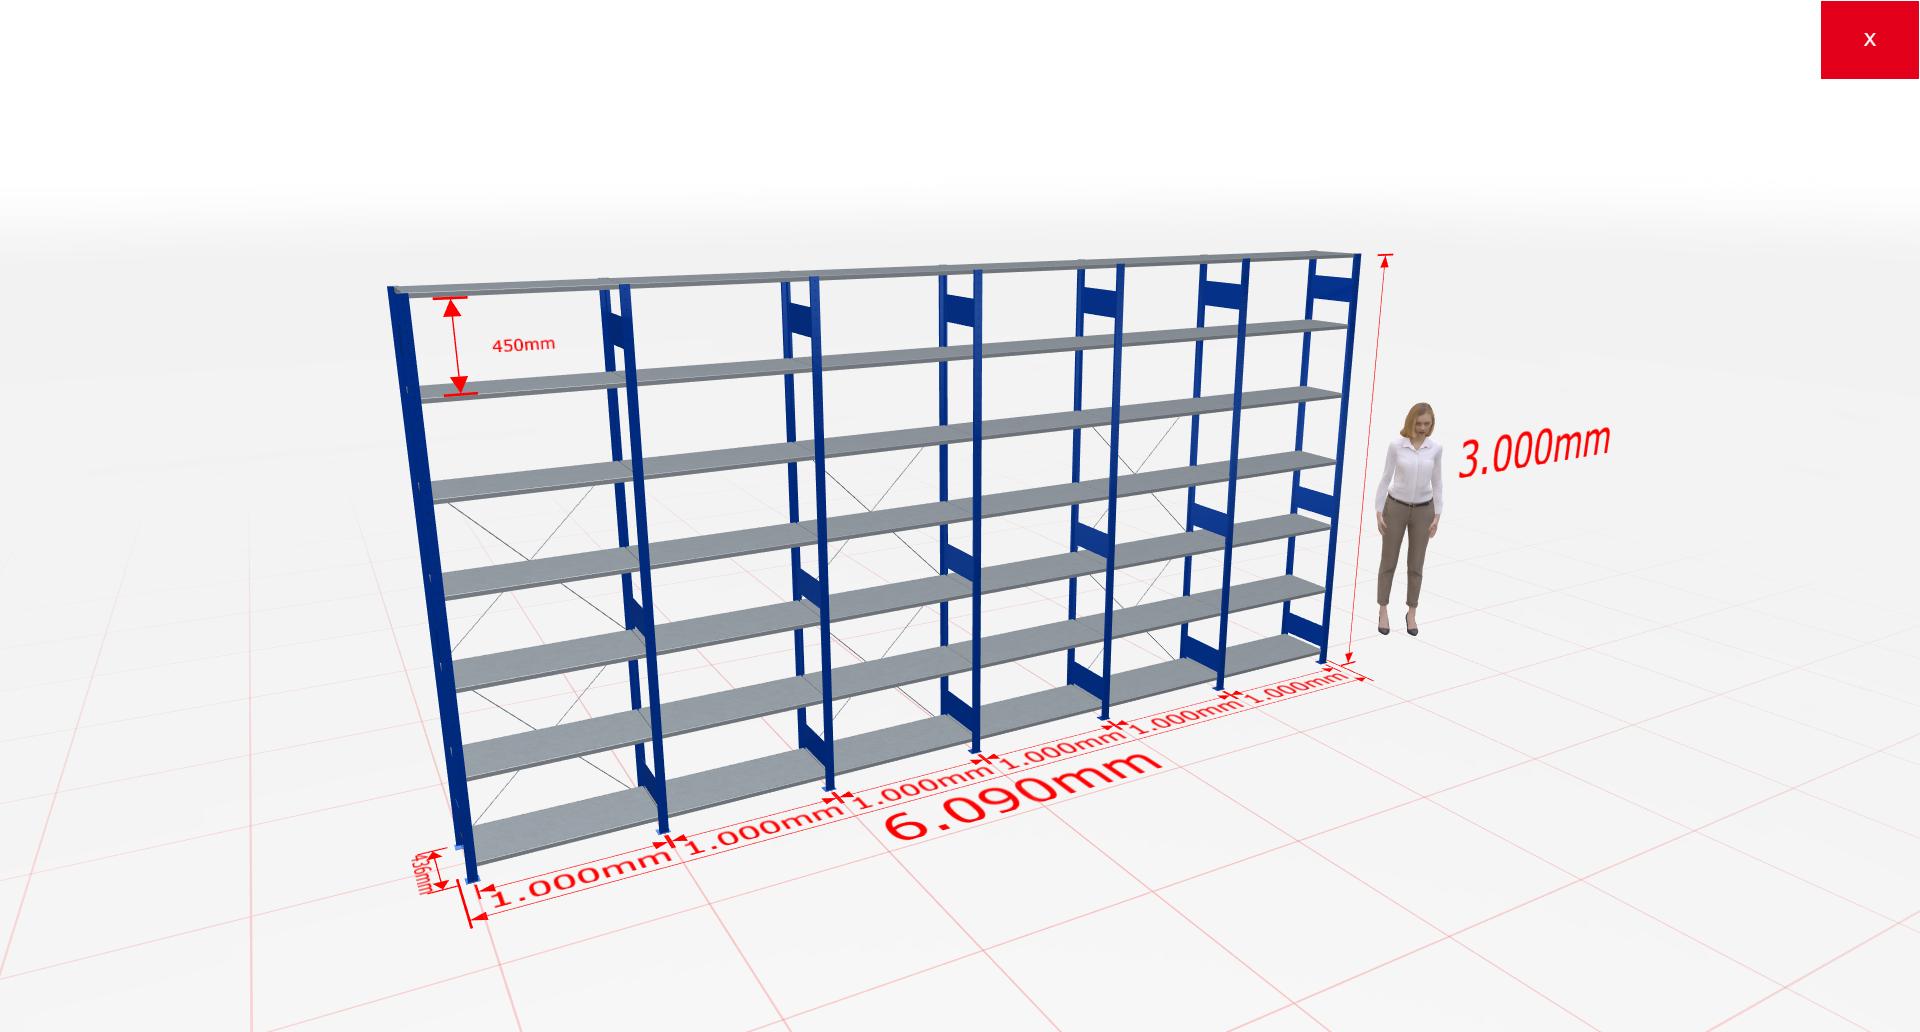 Fachbodenregal Komplettregal 3000x6090x400 mm (HxBxT) SCHULTE Lagertechnik blau 7 Ebenen  150 kg je Boden